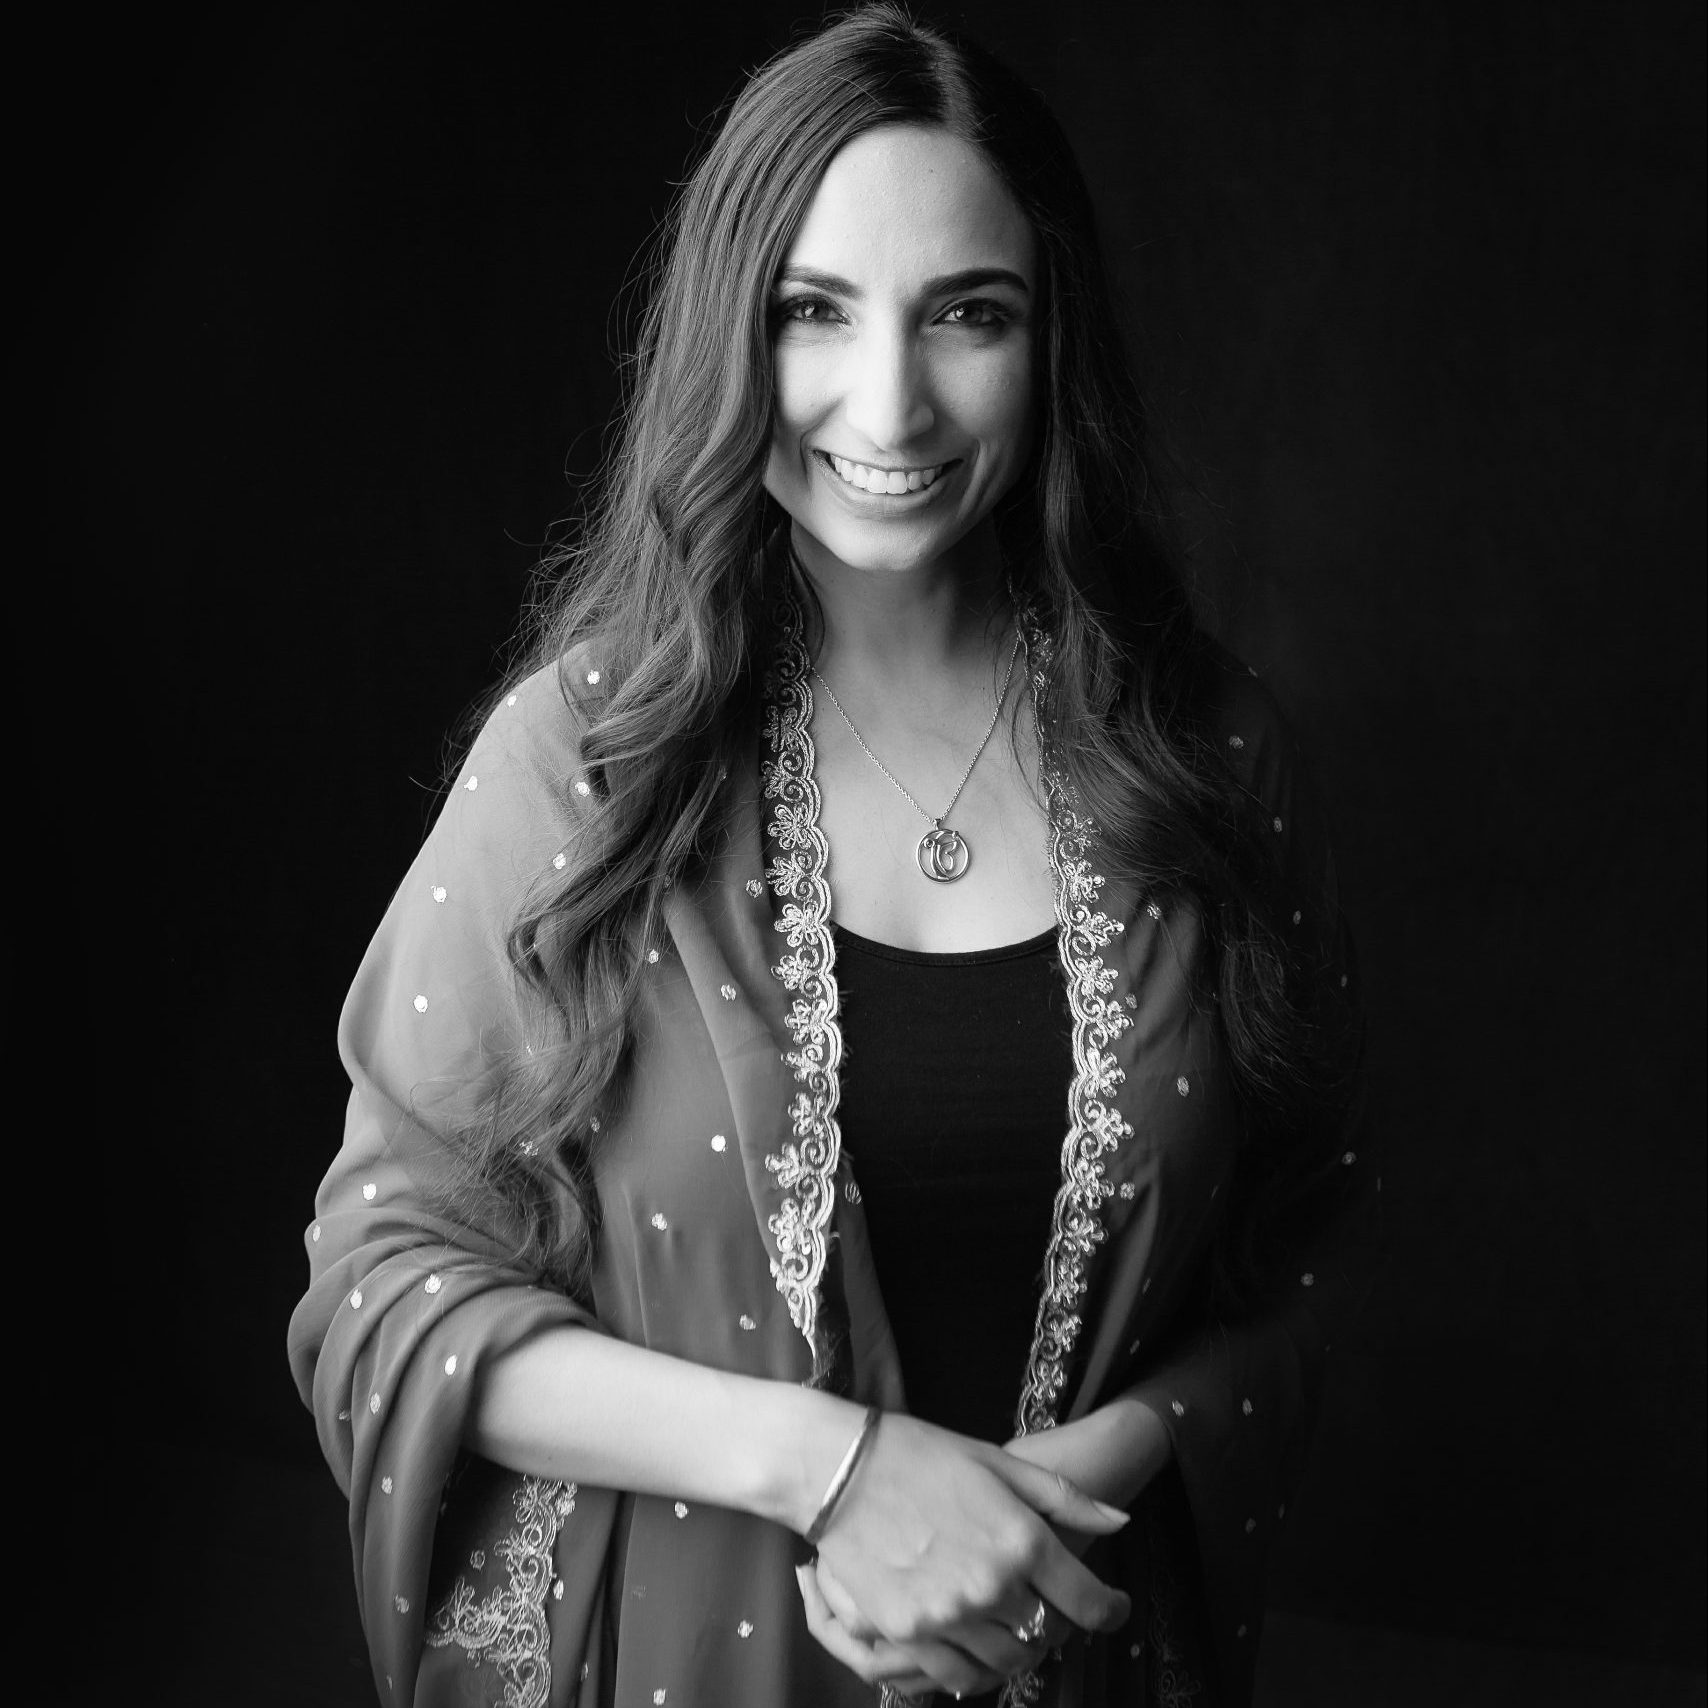 Valarie Kaur, Civil Rights Activist and Organizer, Lawyer, Filmmaker